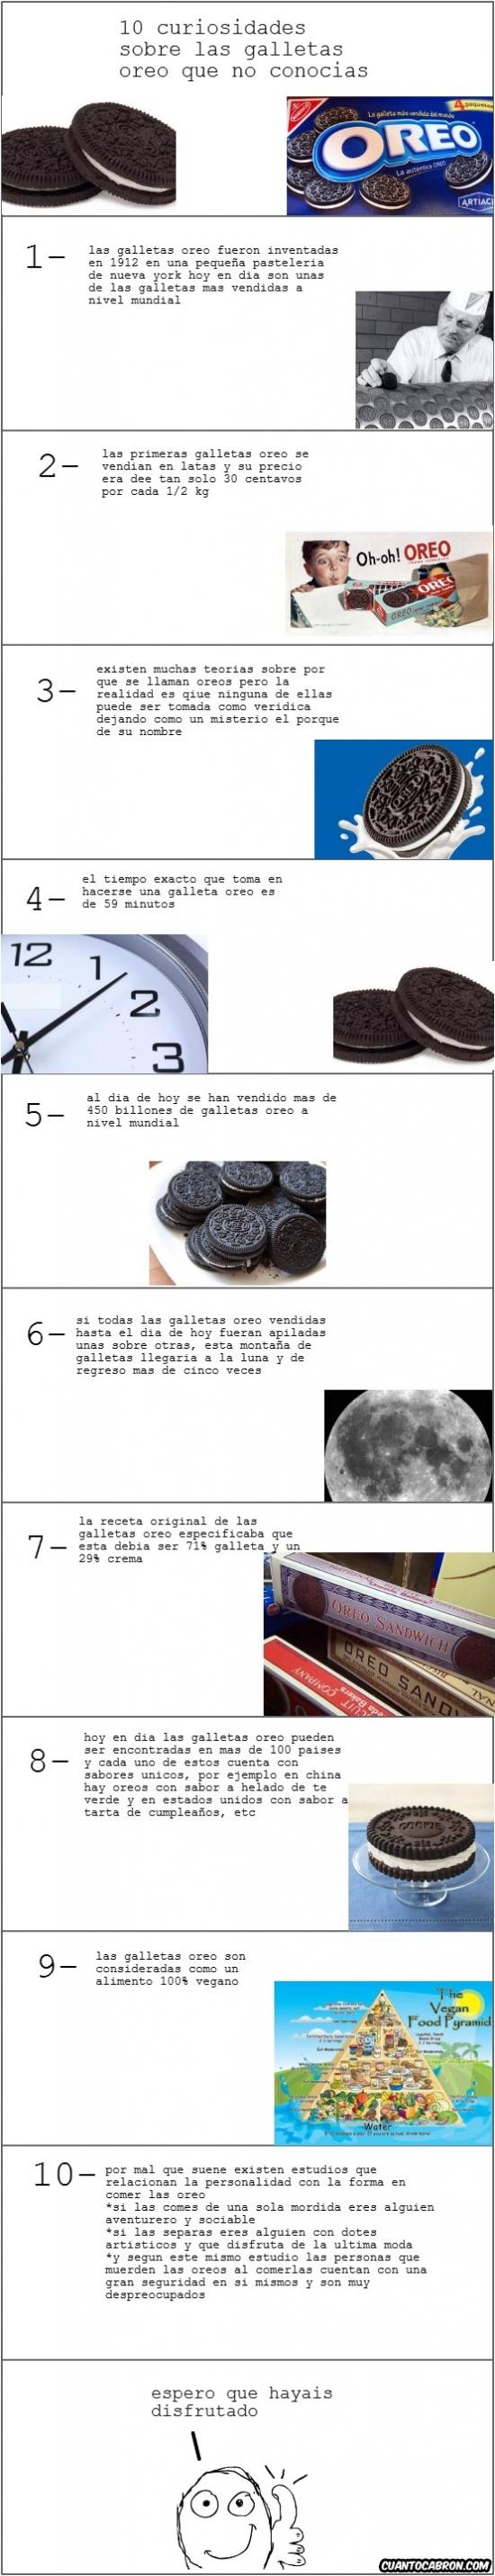 Mix - 10 curiosidades sobre las galletas Oreo